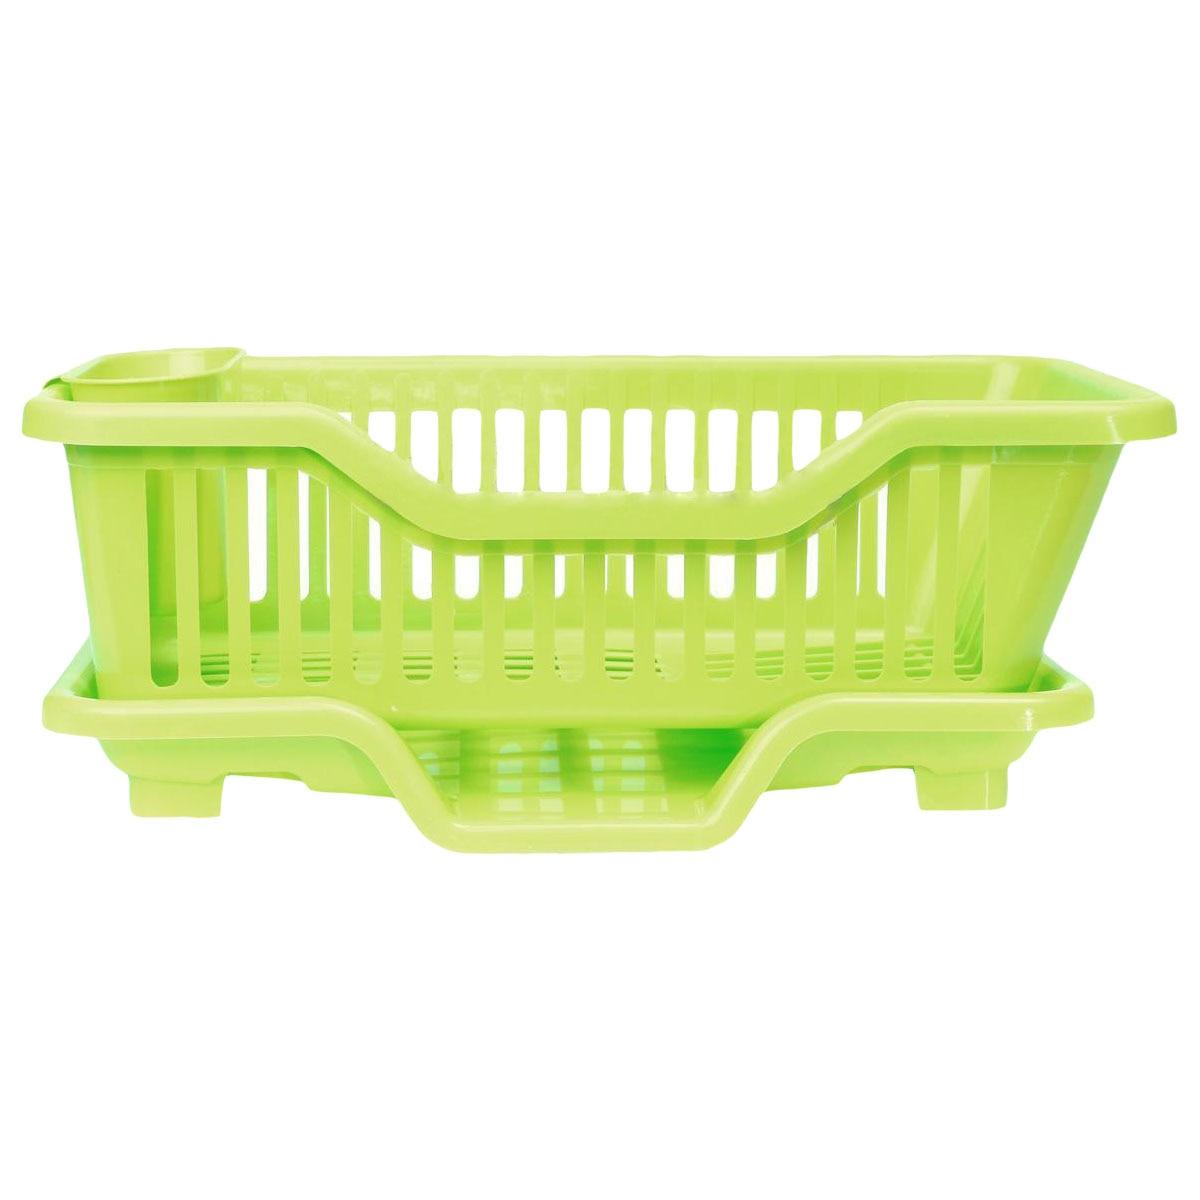 Fashion-Kitchen Sink Dish Plate Utensil Drainer Drying Rack Holder Basket Organizer Tray